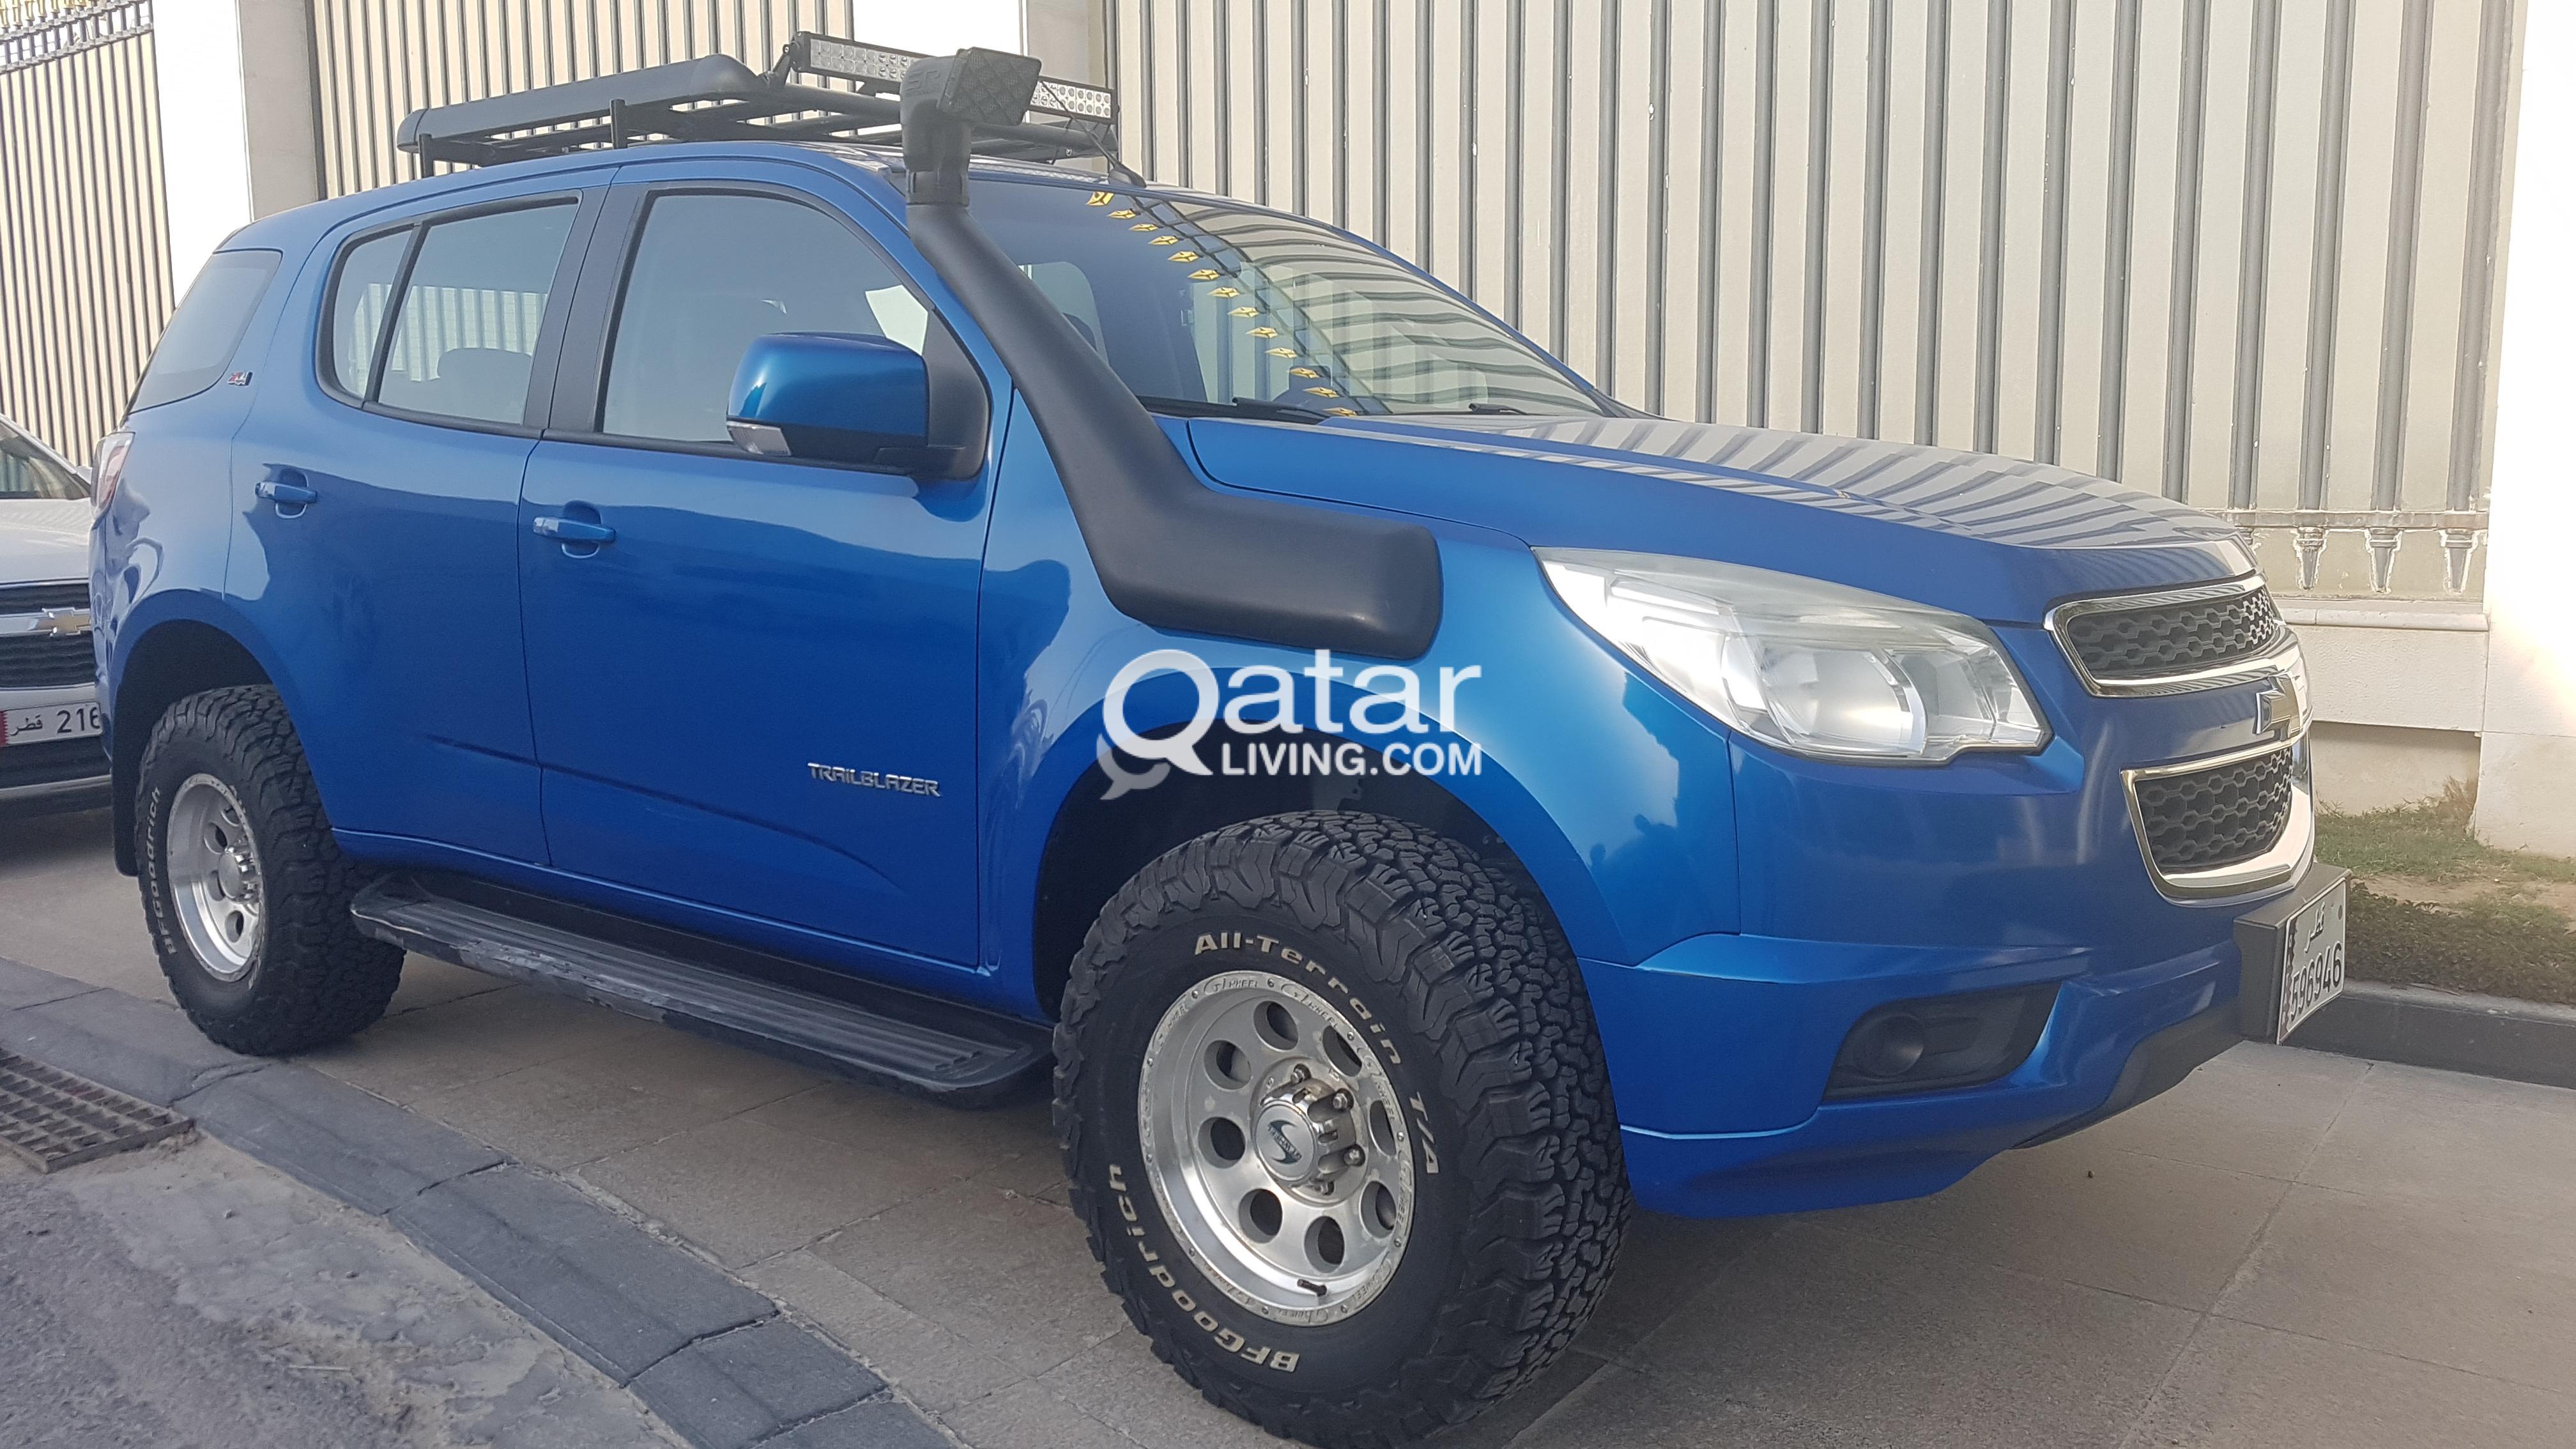 Chevrolet Trailblazer LT 2013 4x4 | Qatar Living